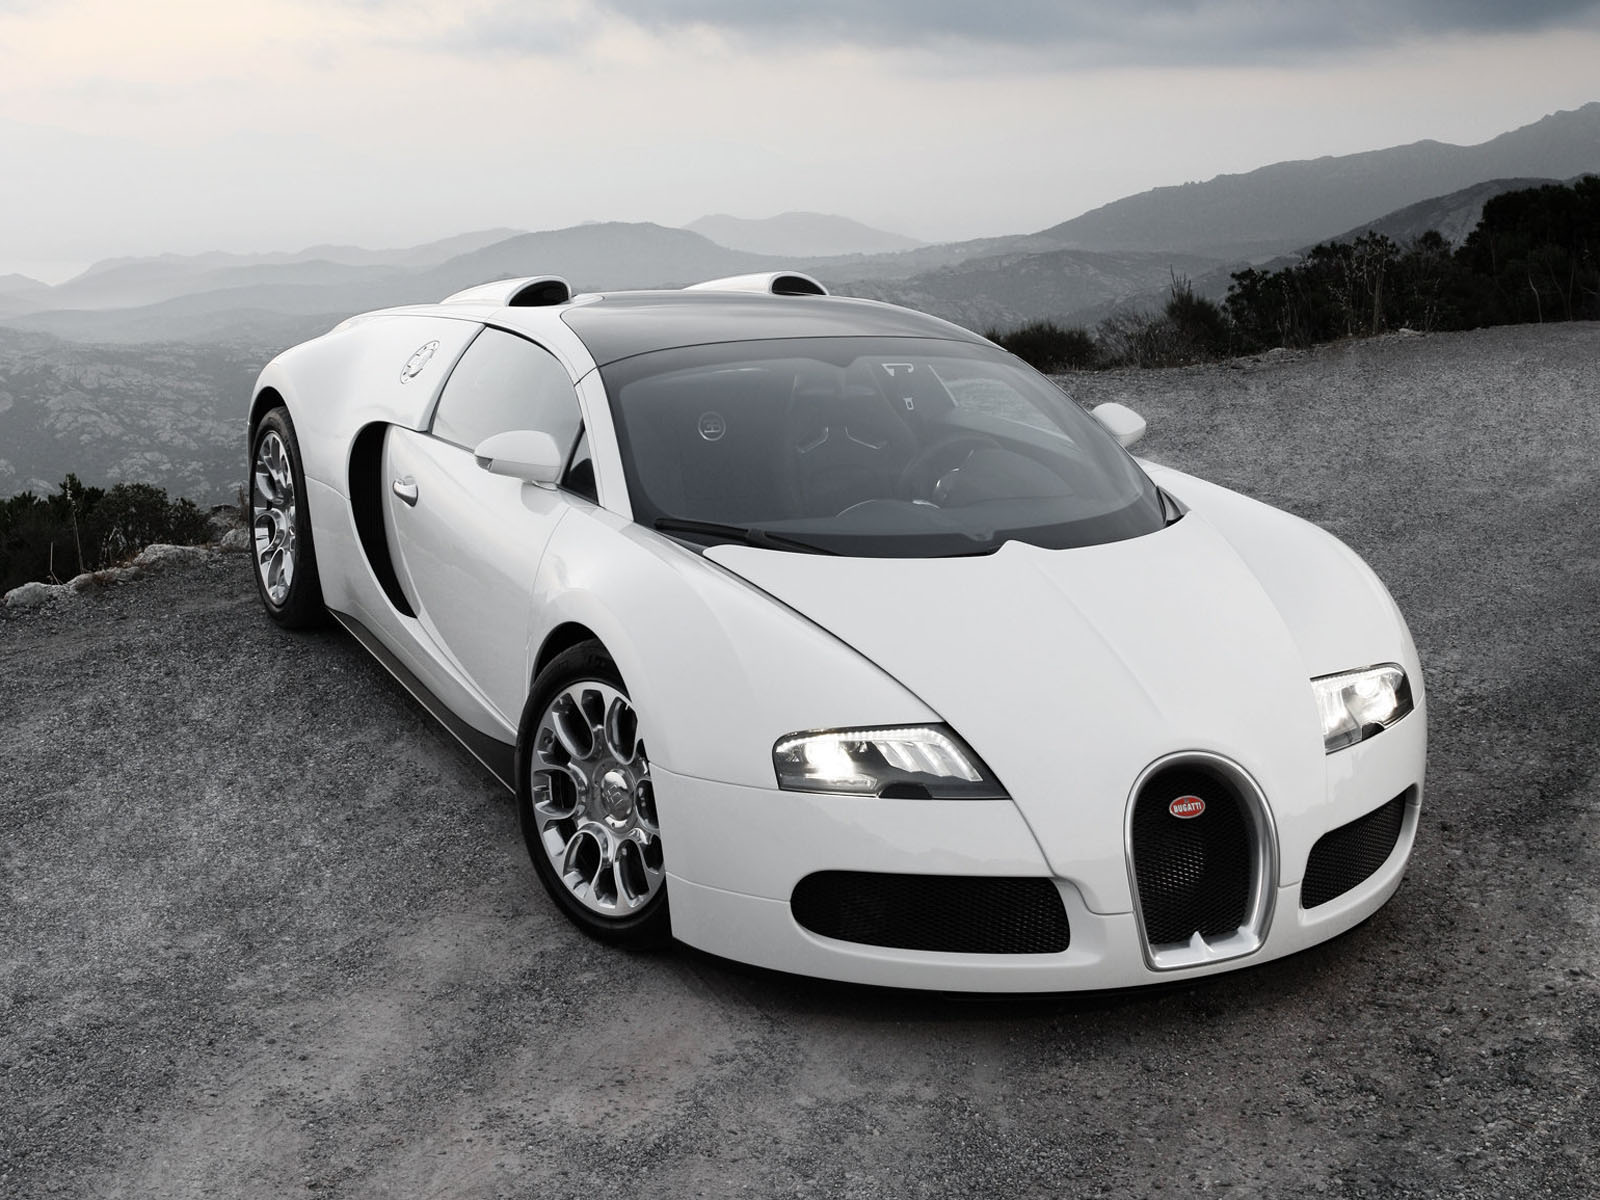 Bugatti Veyron Grand Sport White Wallpaper For Desktop